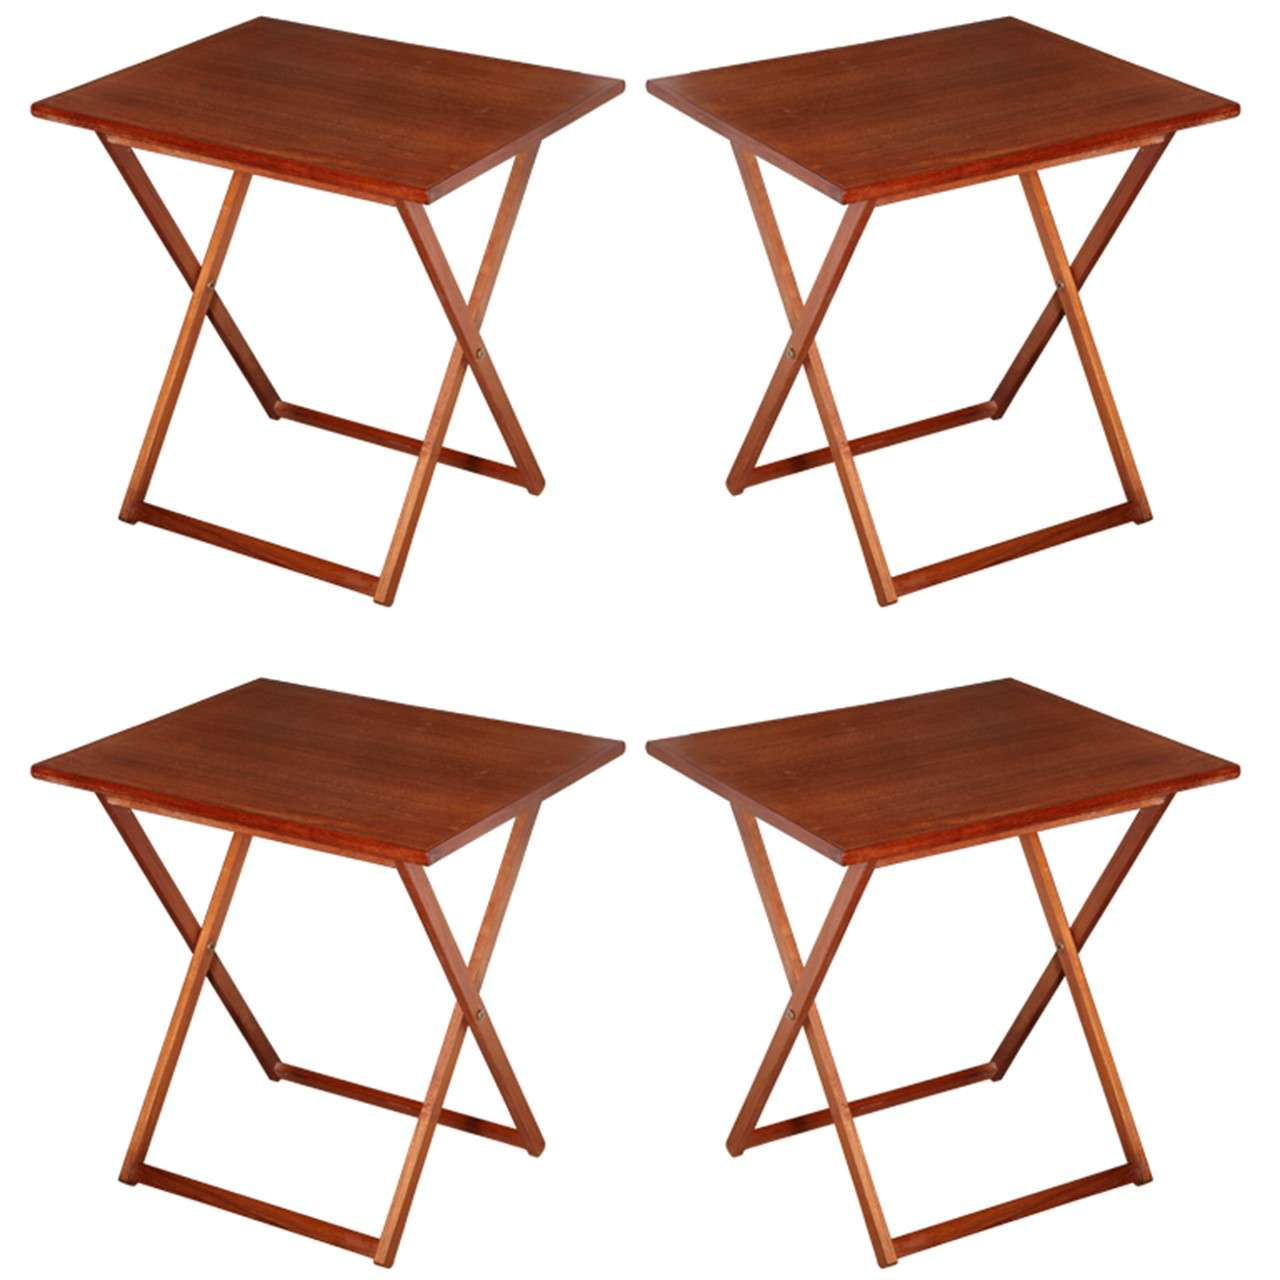 1960s Set of Four Scandinavian Modern Teak Folding Tray Tables by Kalmar